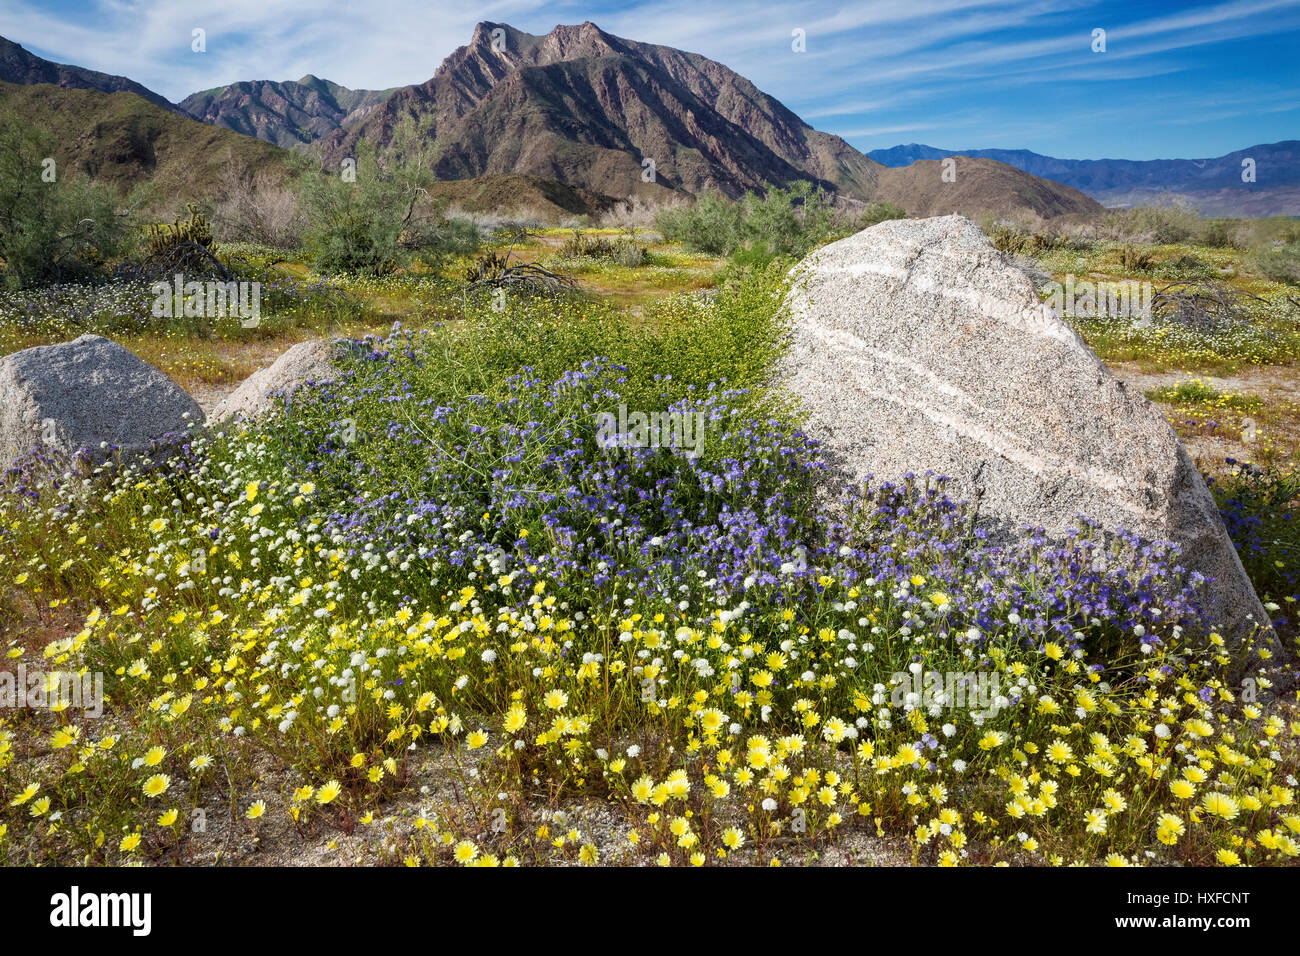 Spring flowers blooming in anza borrego desert state park stock spring flowers blooming in anza borrego desert state park california usa 2017 mightylinksfo